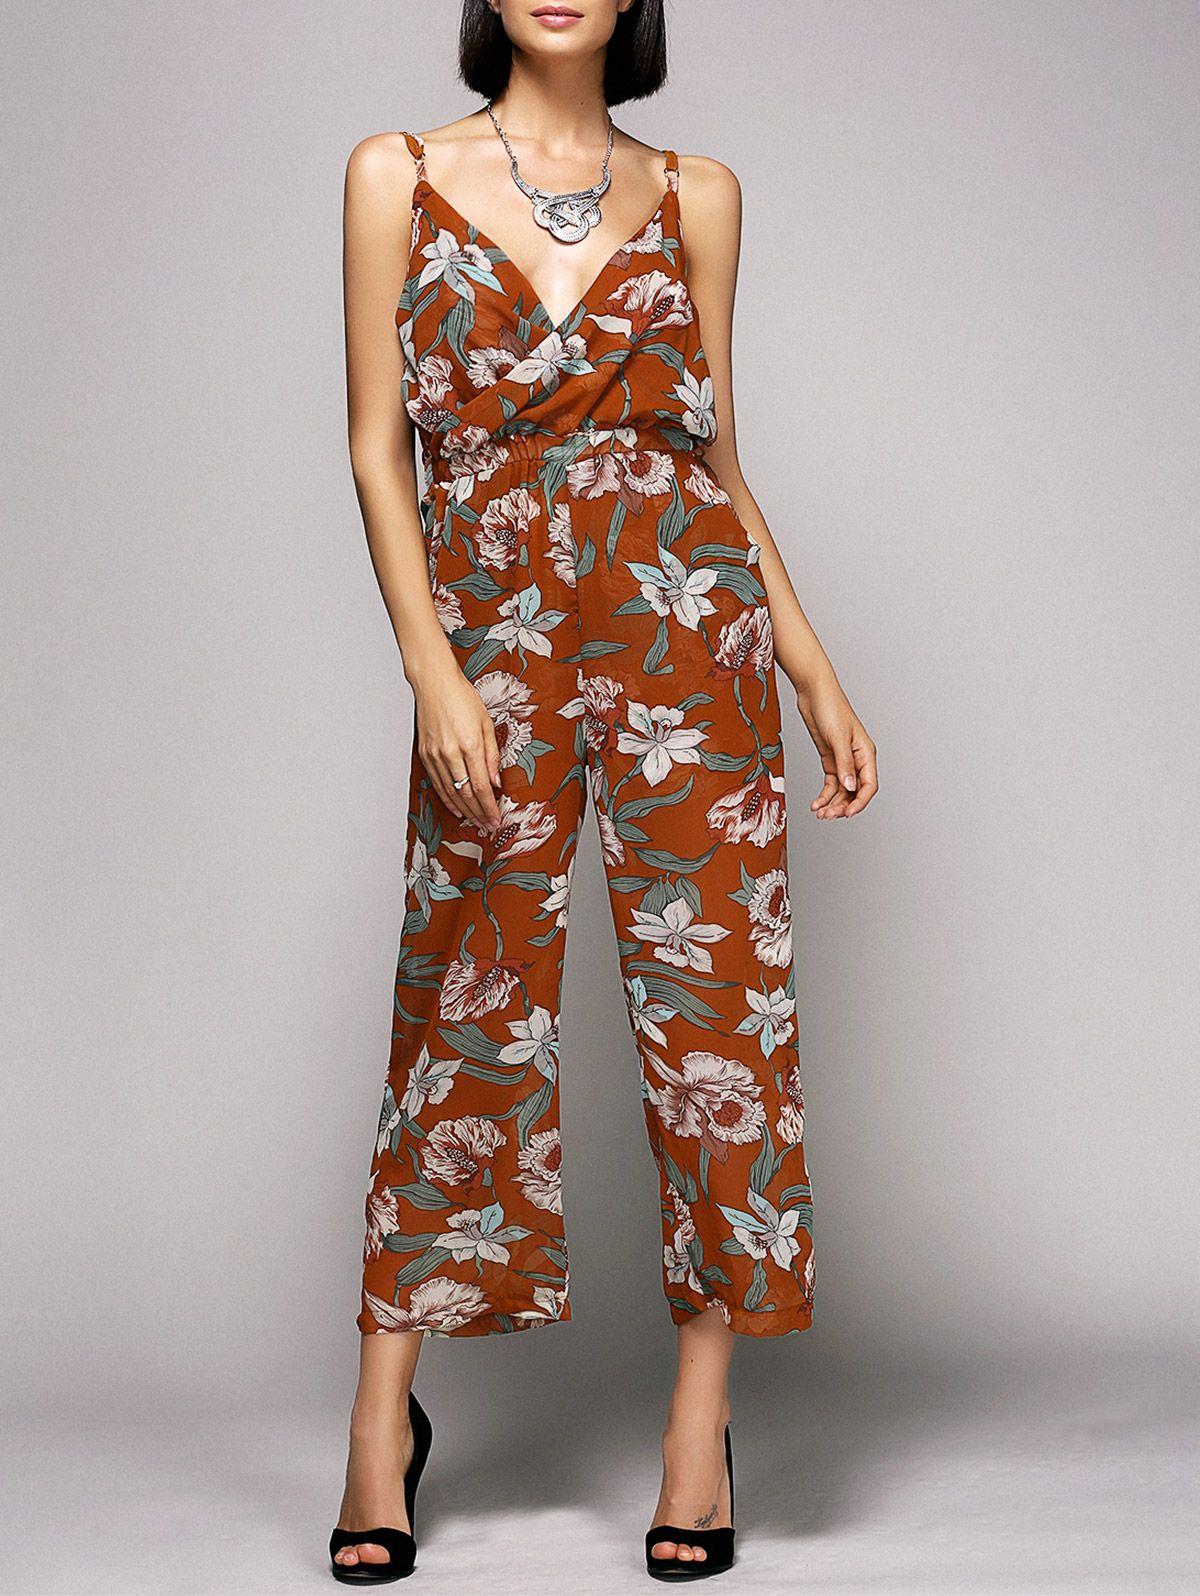 54511a5ffaa Retro Style Spaghetti Strap Floral Print Slimming Jumpsuit